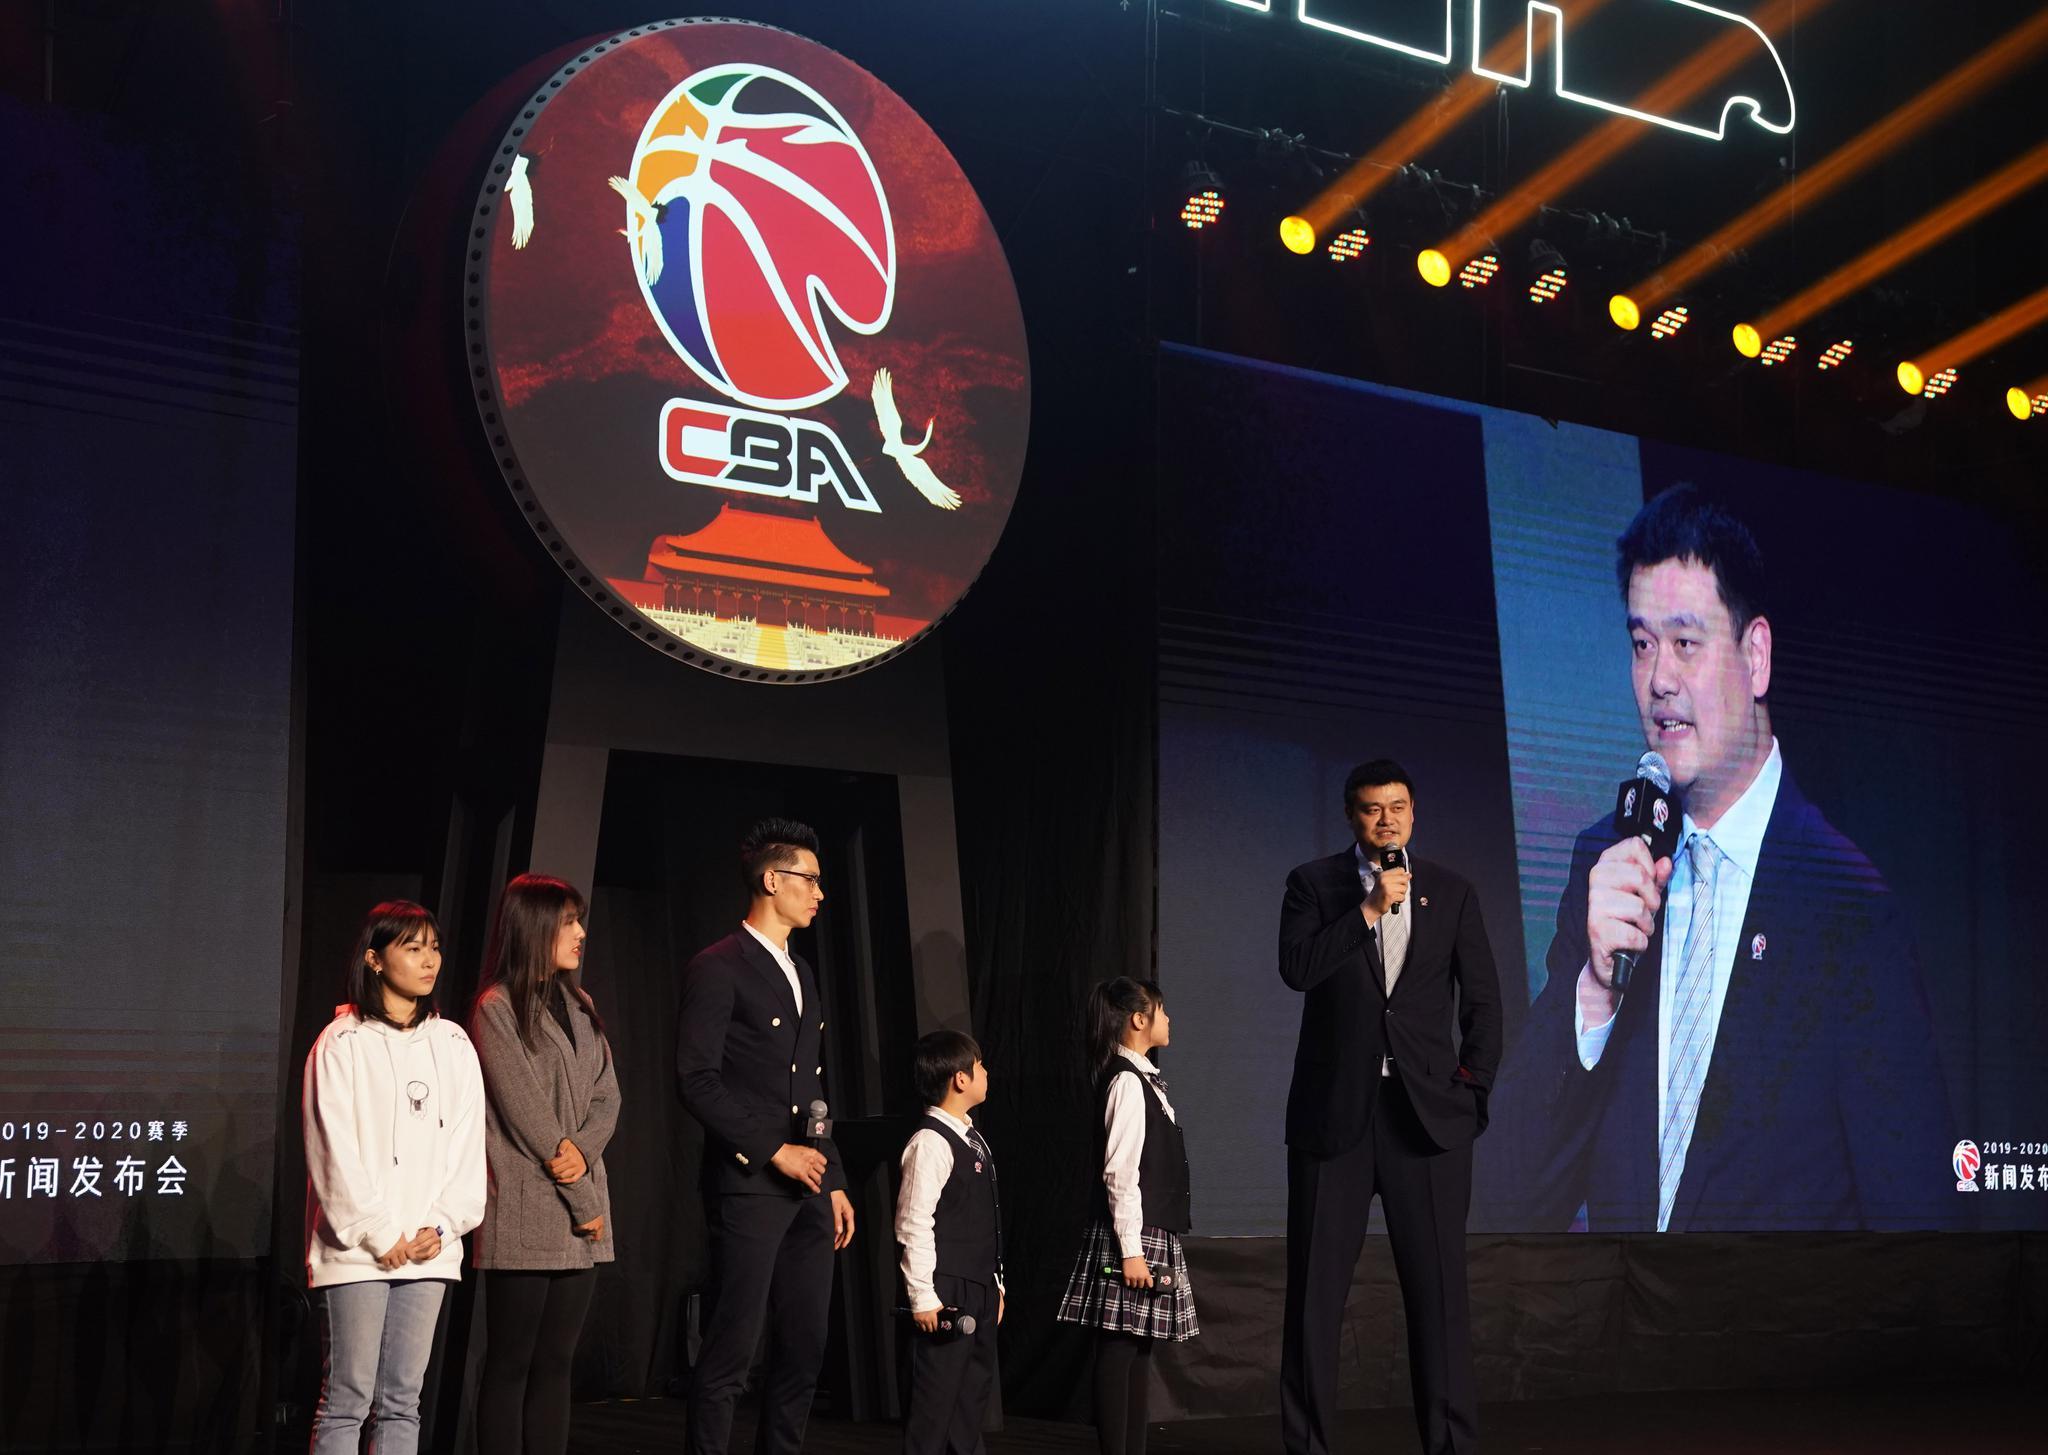 CBA新赛季将调整部分开赛时间 新设官方暂停